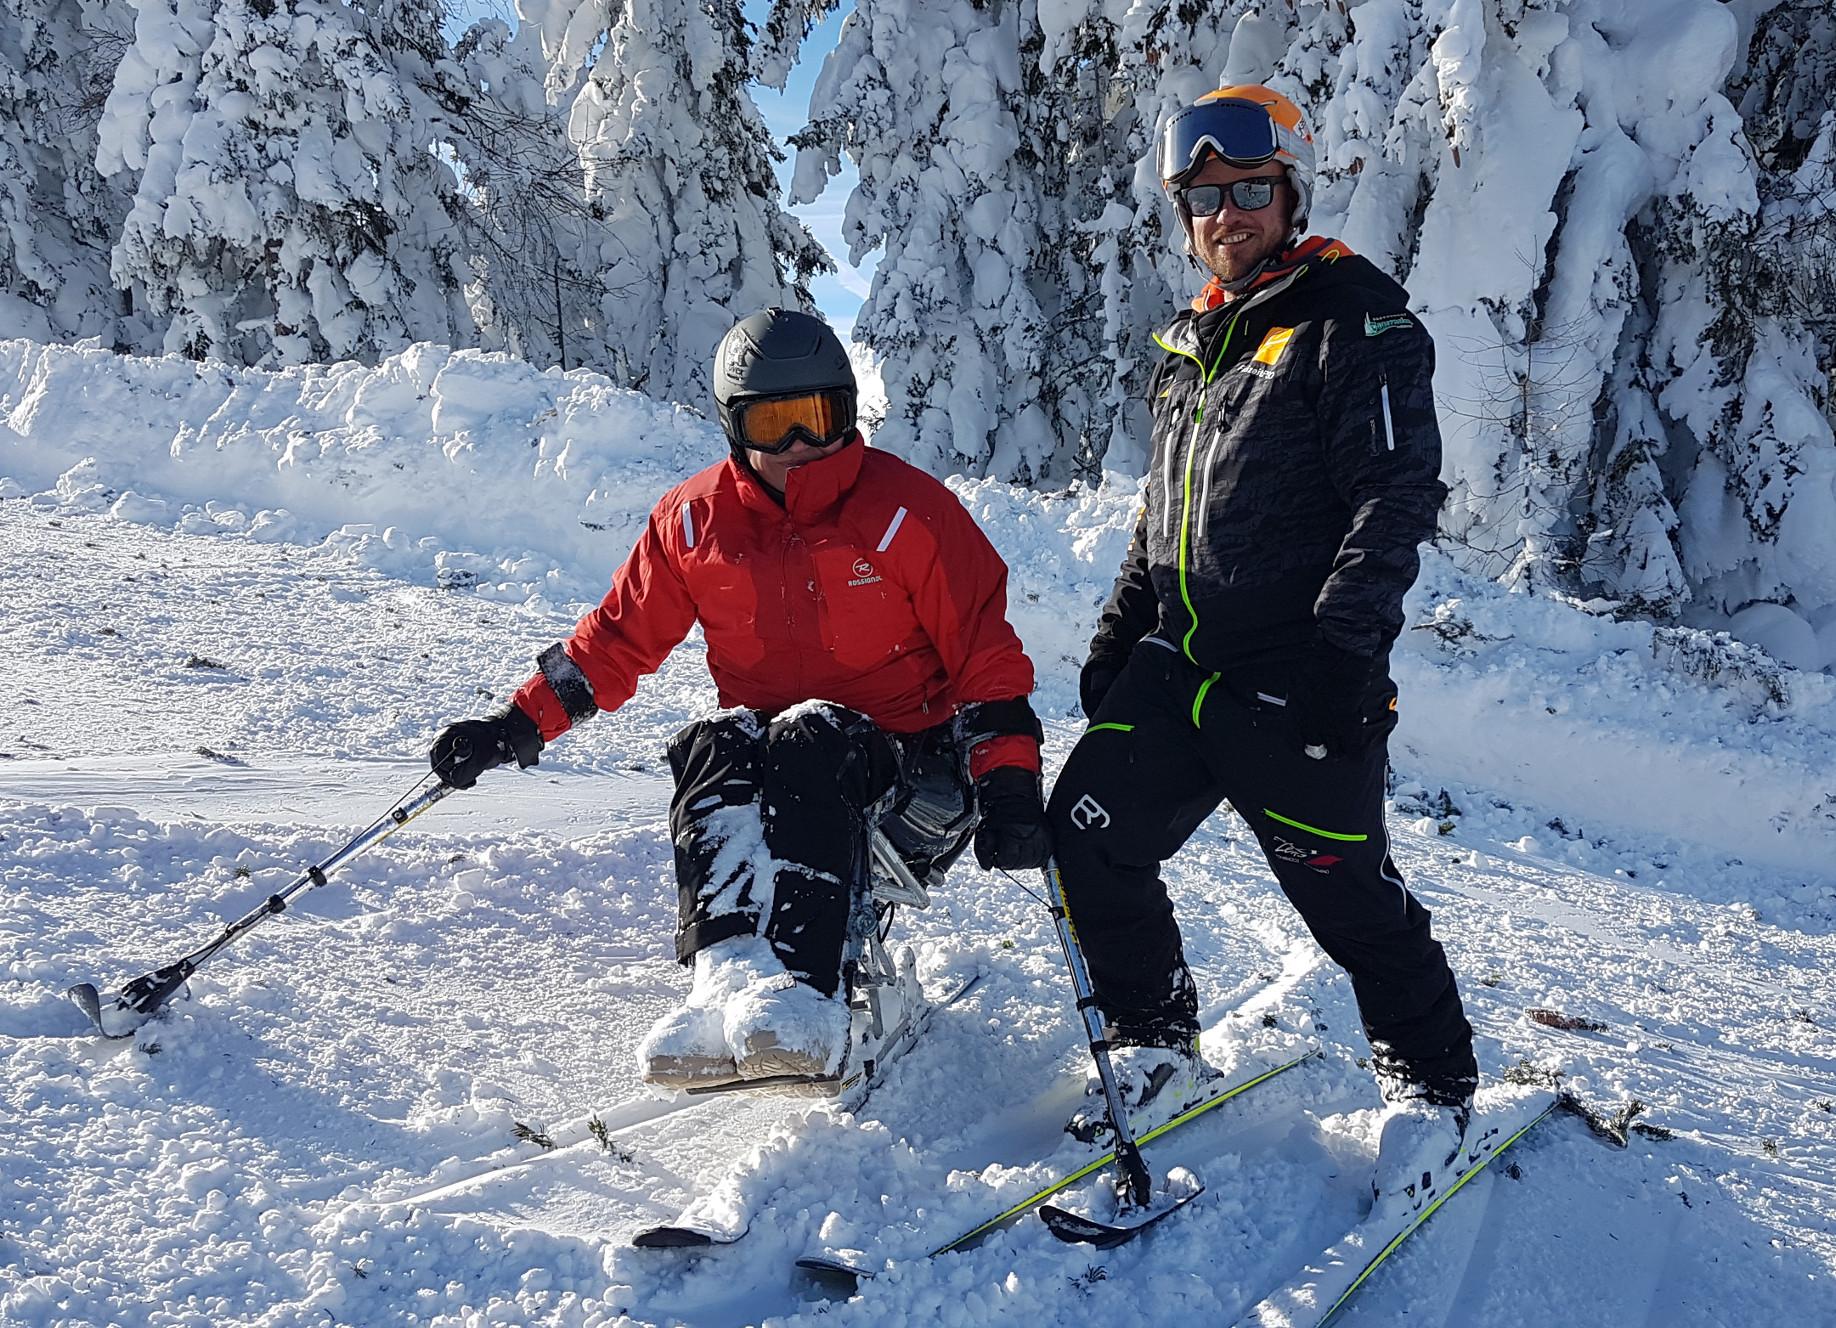 Skifahren mit Monoski